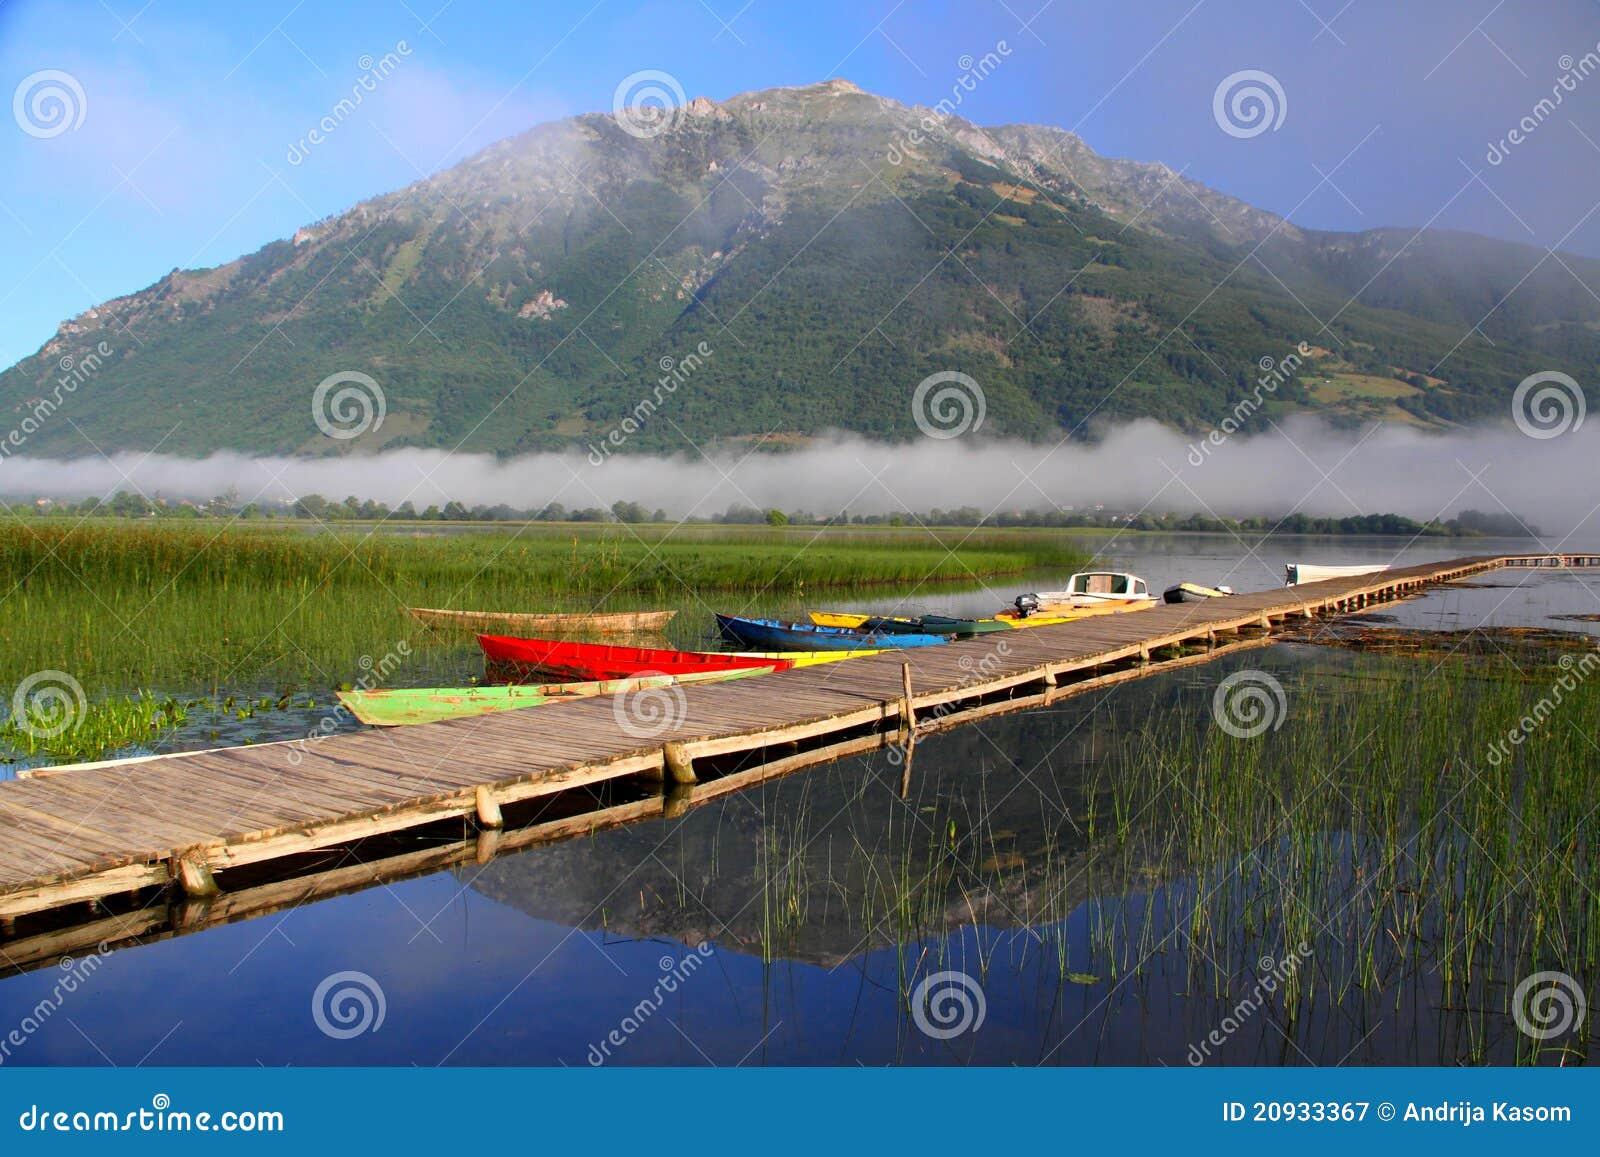 Lakeplav